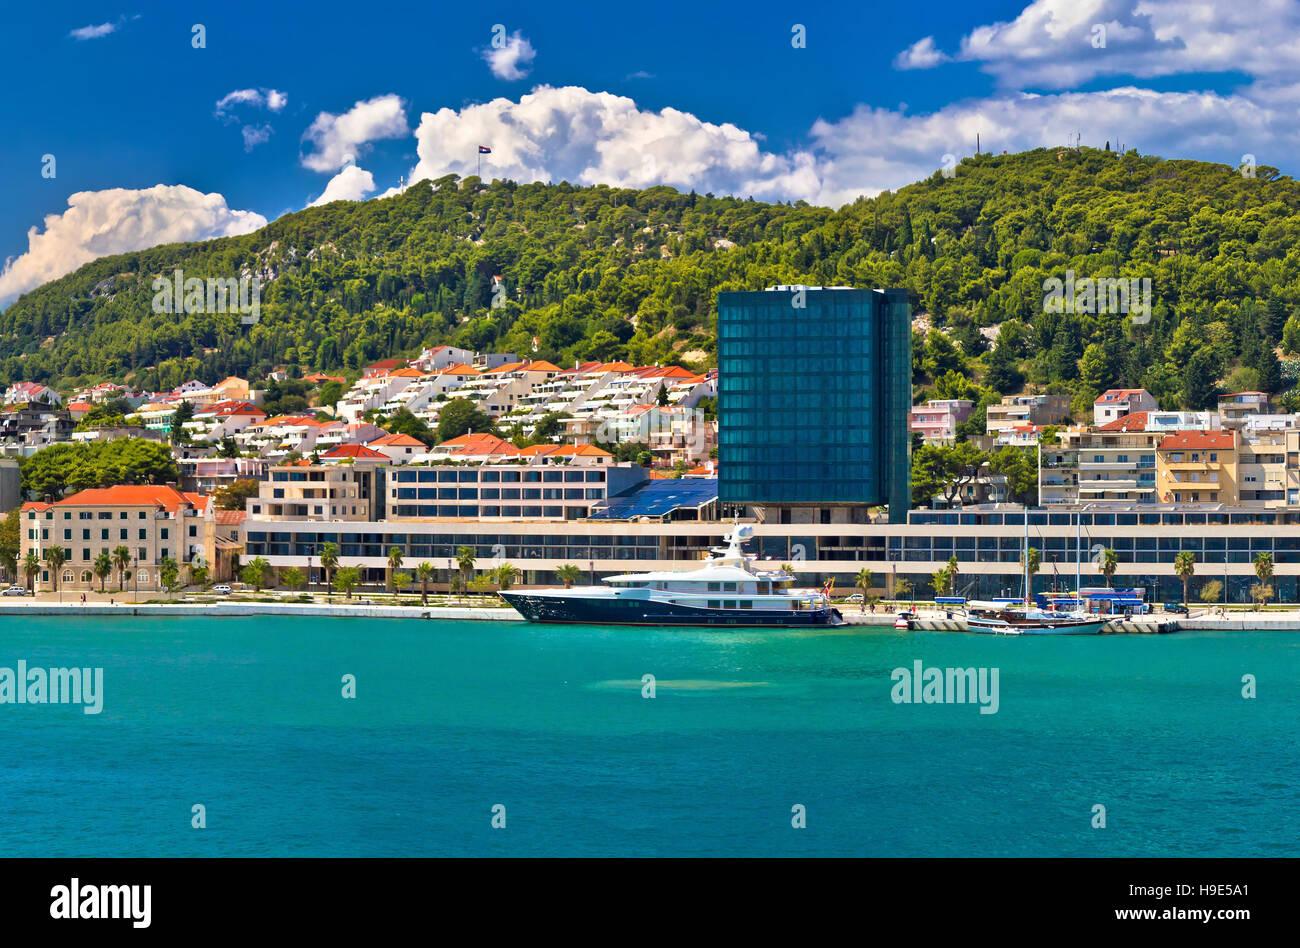 Yachting waterfront of Split and Marjan hill view, Dalmatia, Croatia - Stock Image